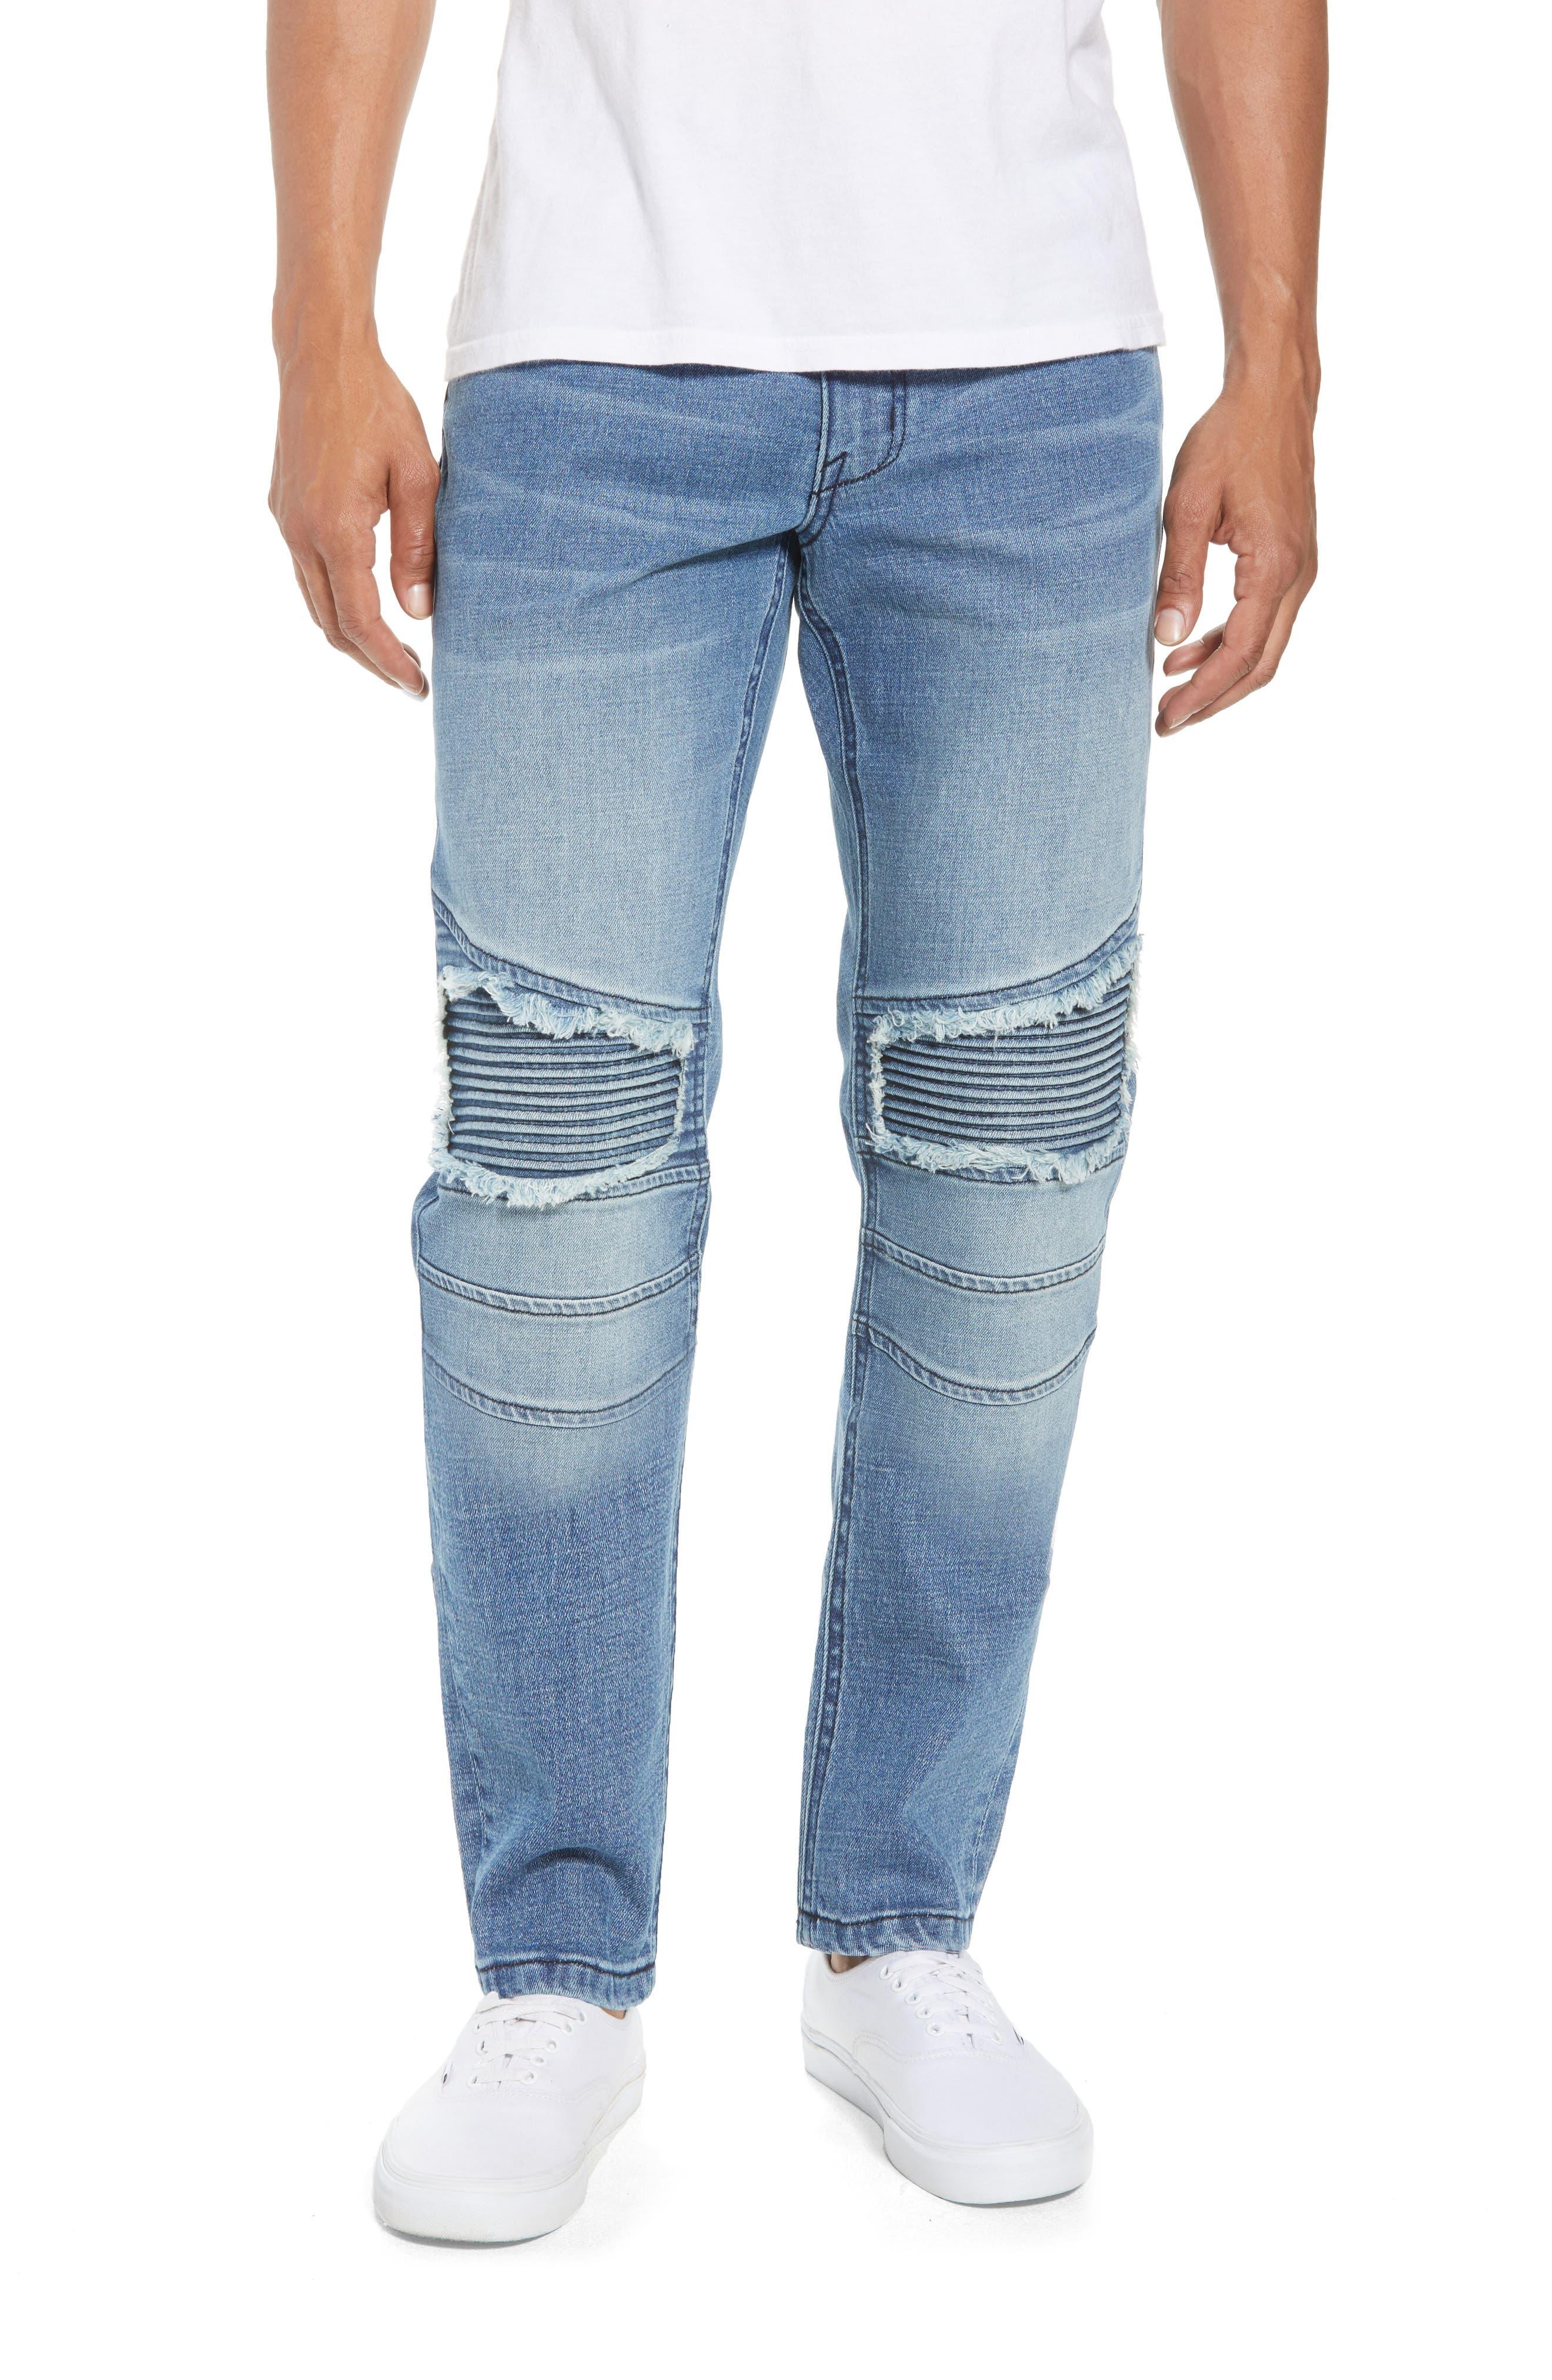 Skinny Moto Jeans,                         Main,                         color, BLUE RIVERS WASH